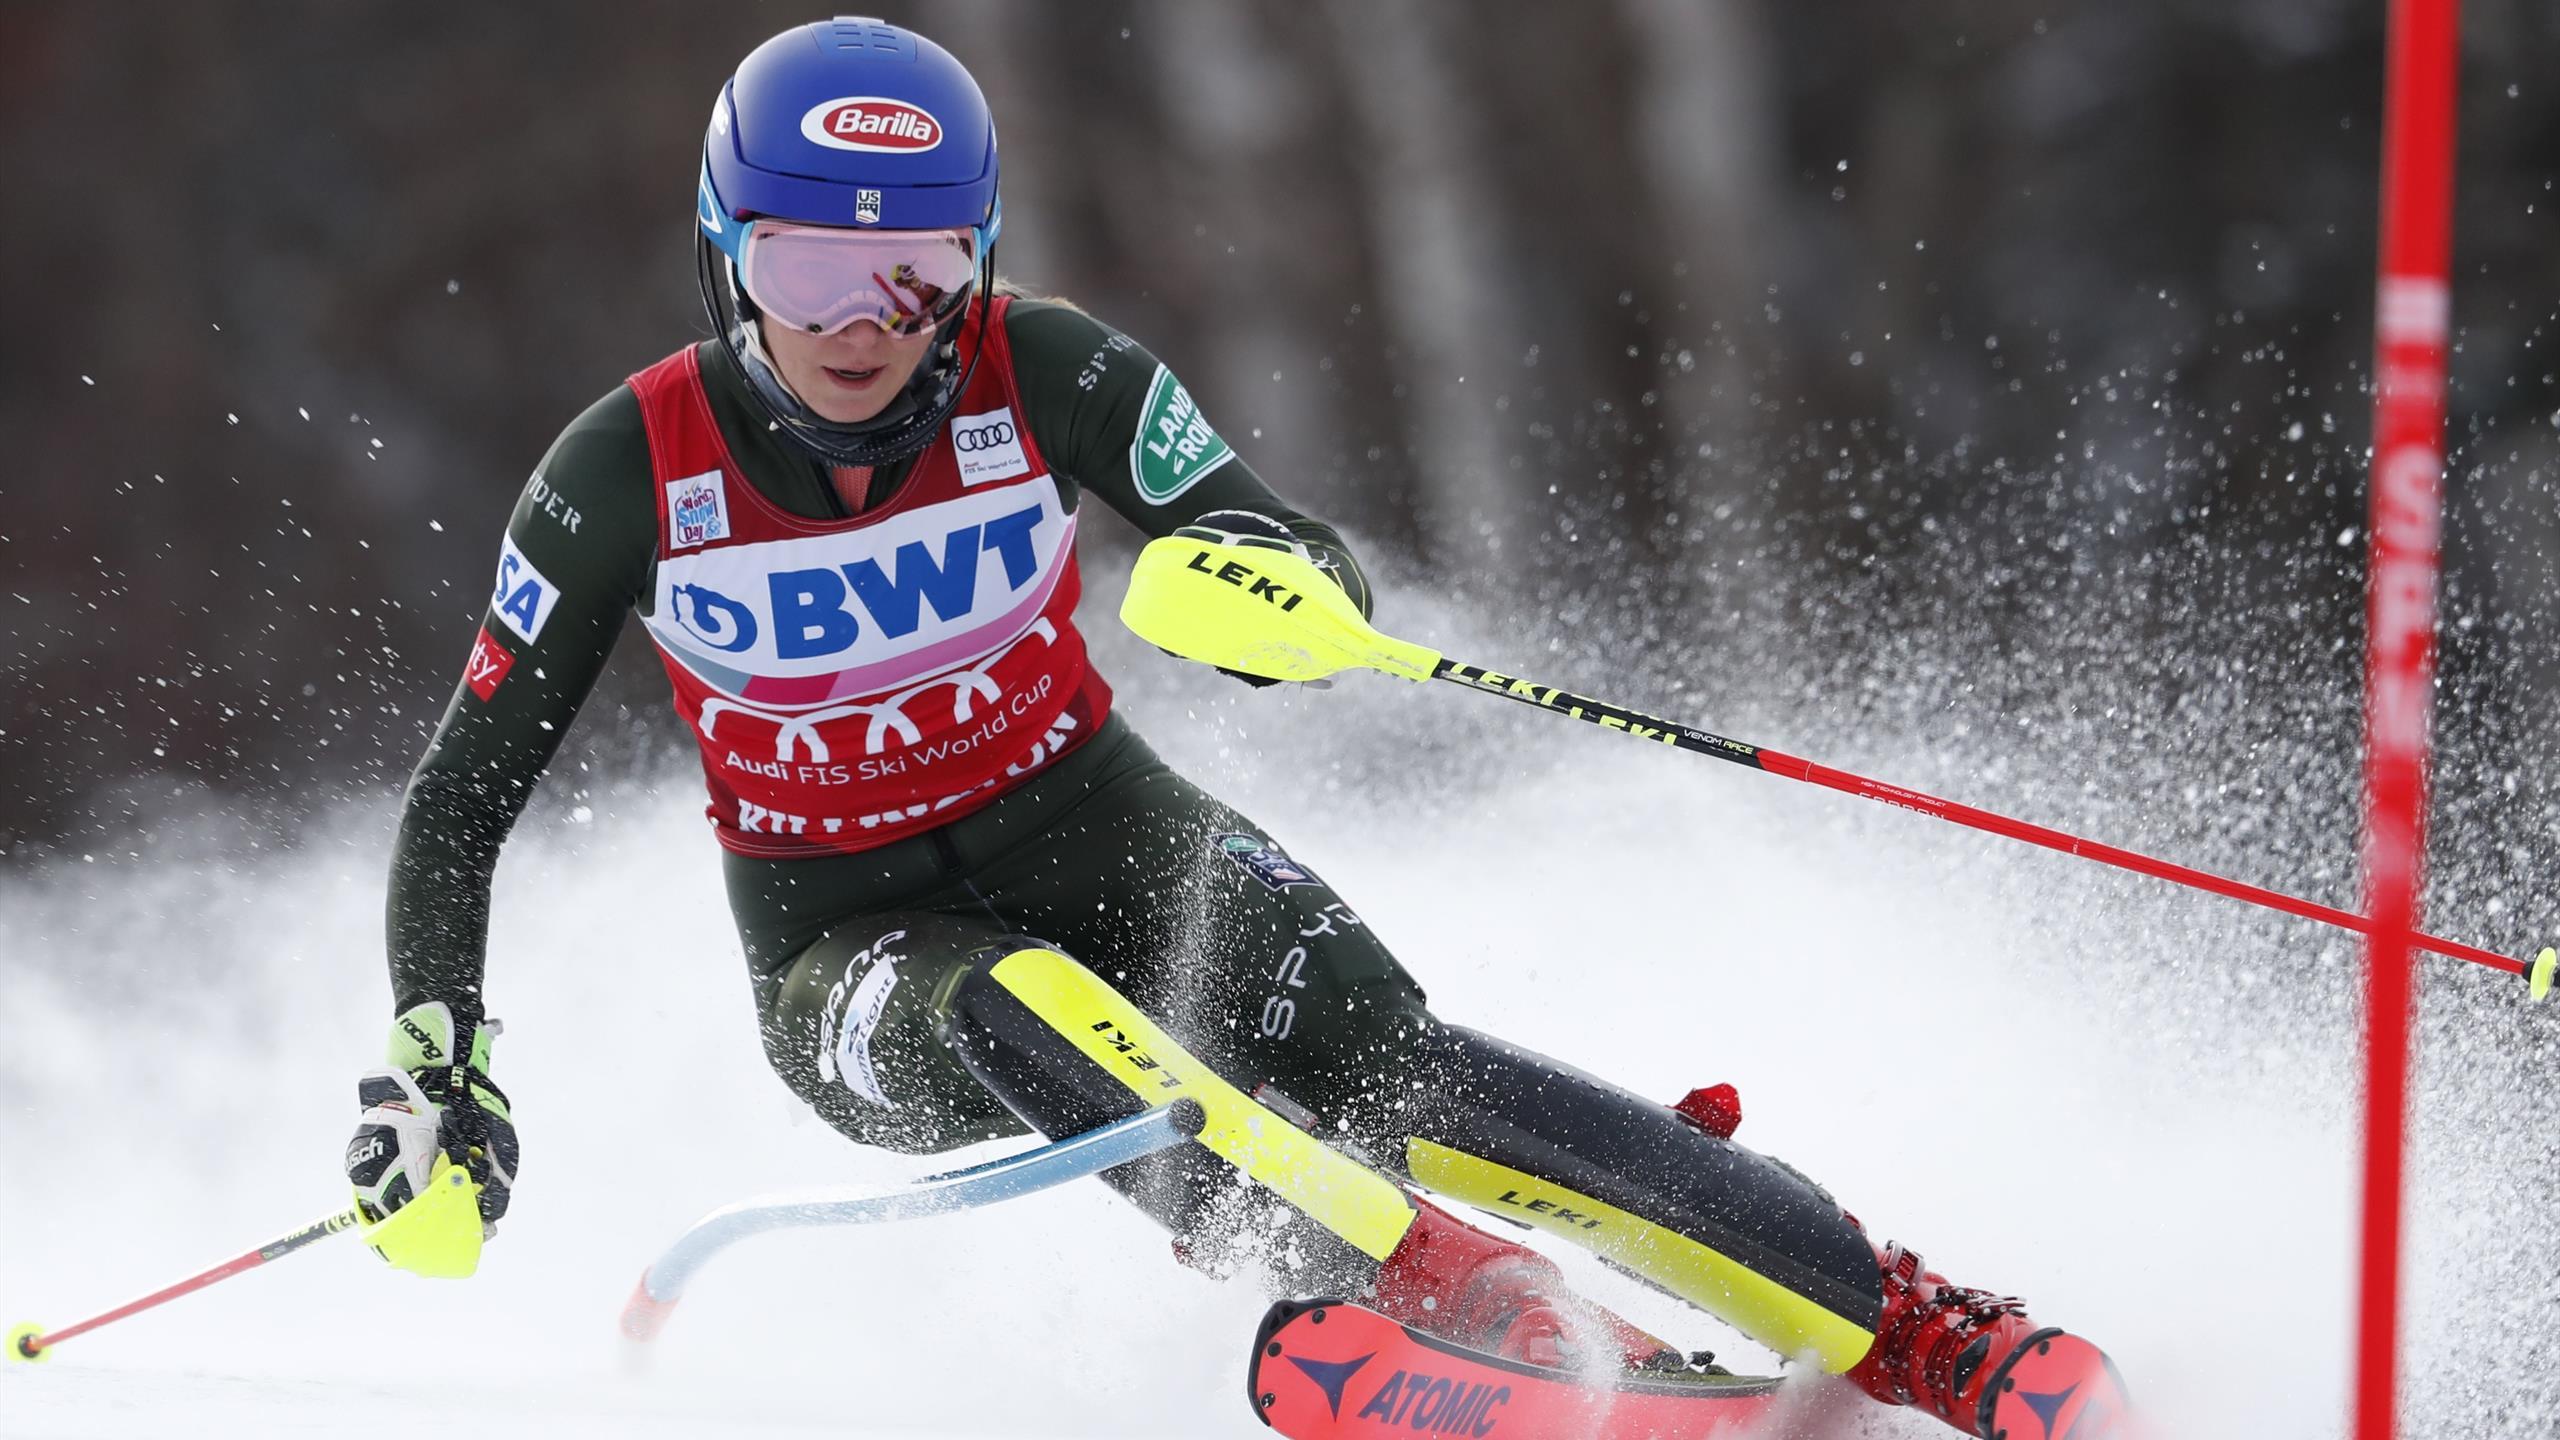 St Moritz Slalom